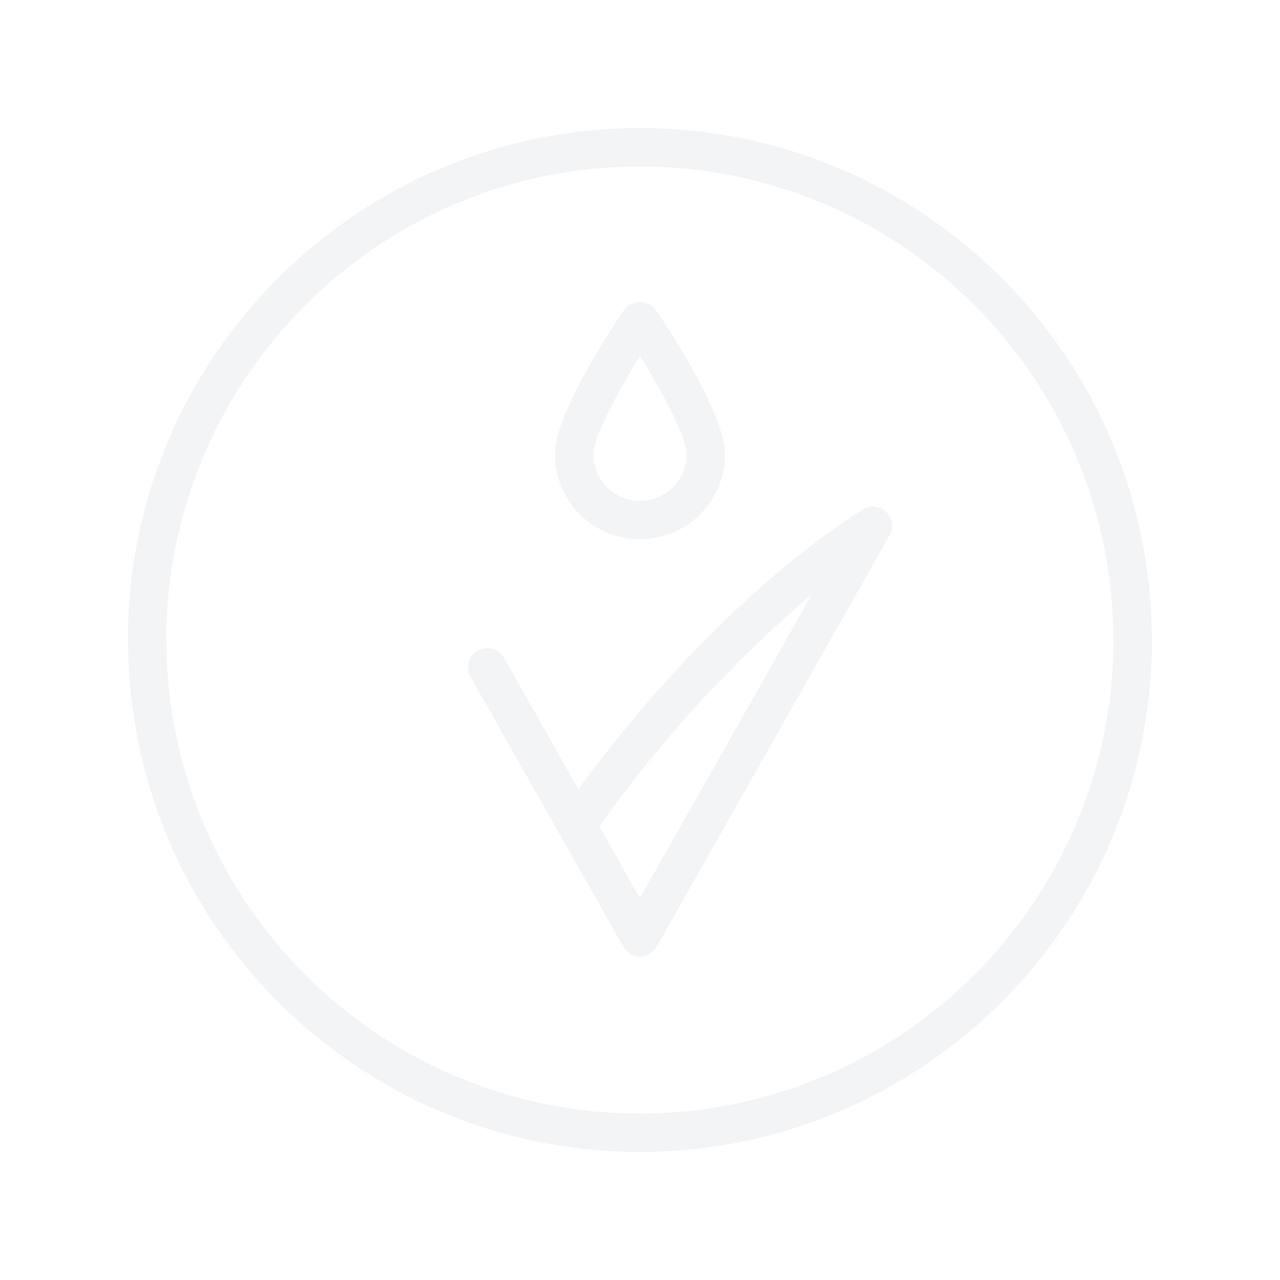 VITA LIBERATA Body Blur Instant HD Skin Finish Medium 100ml